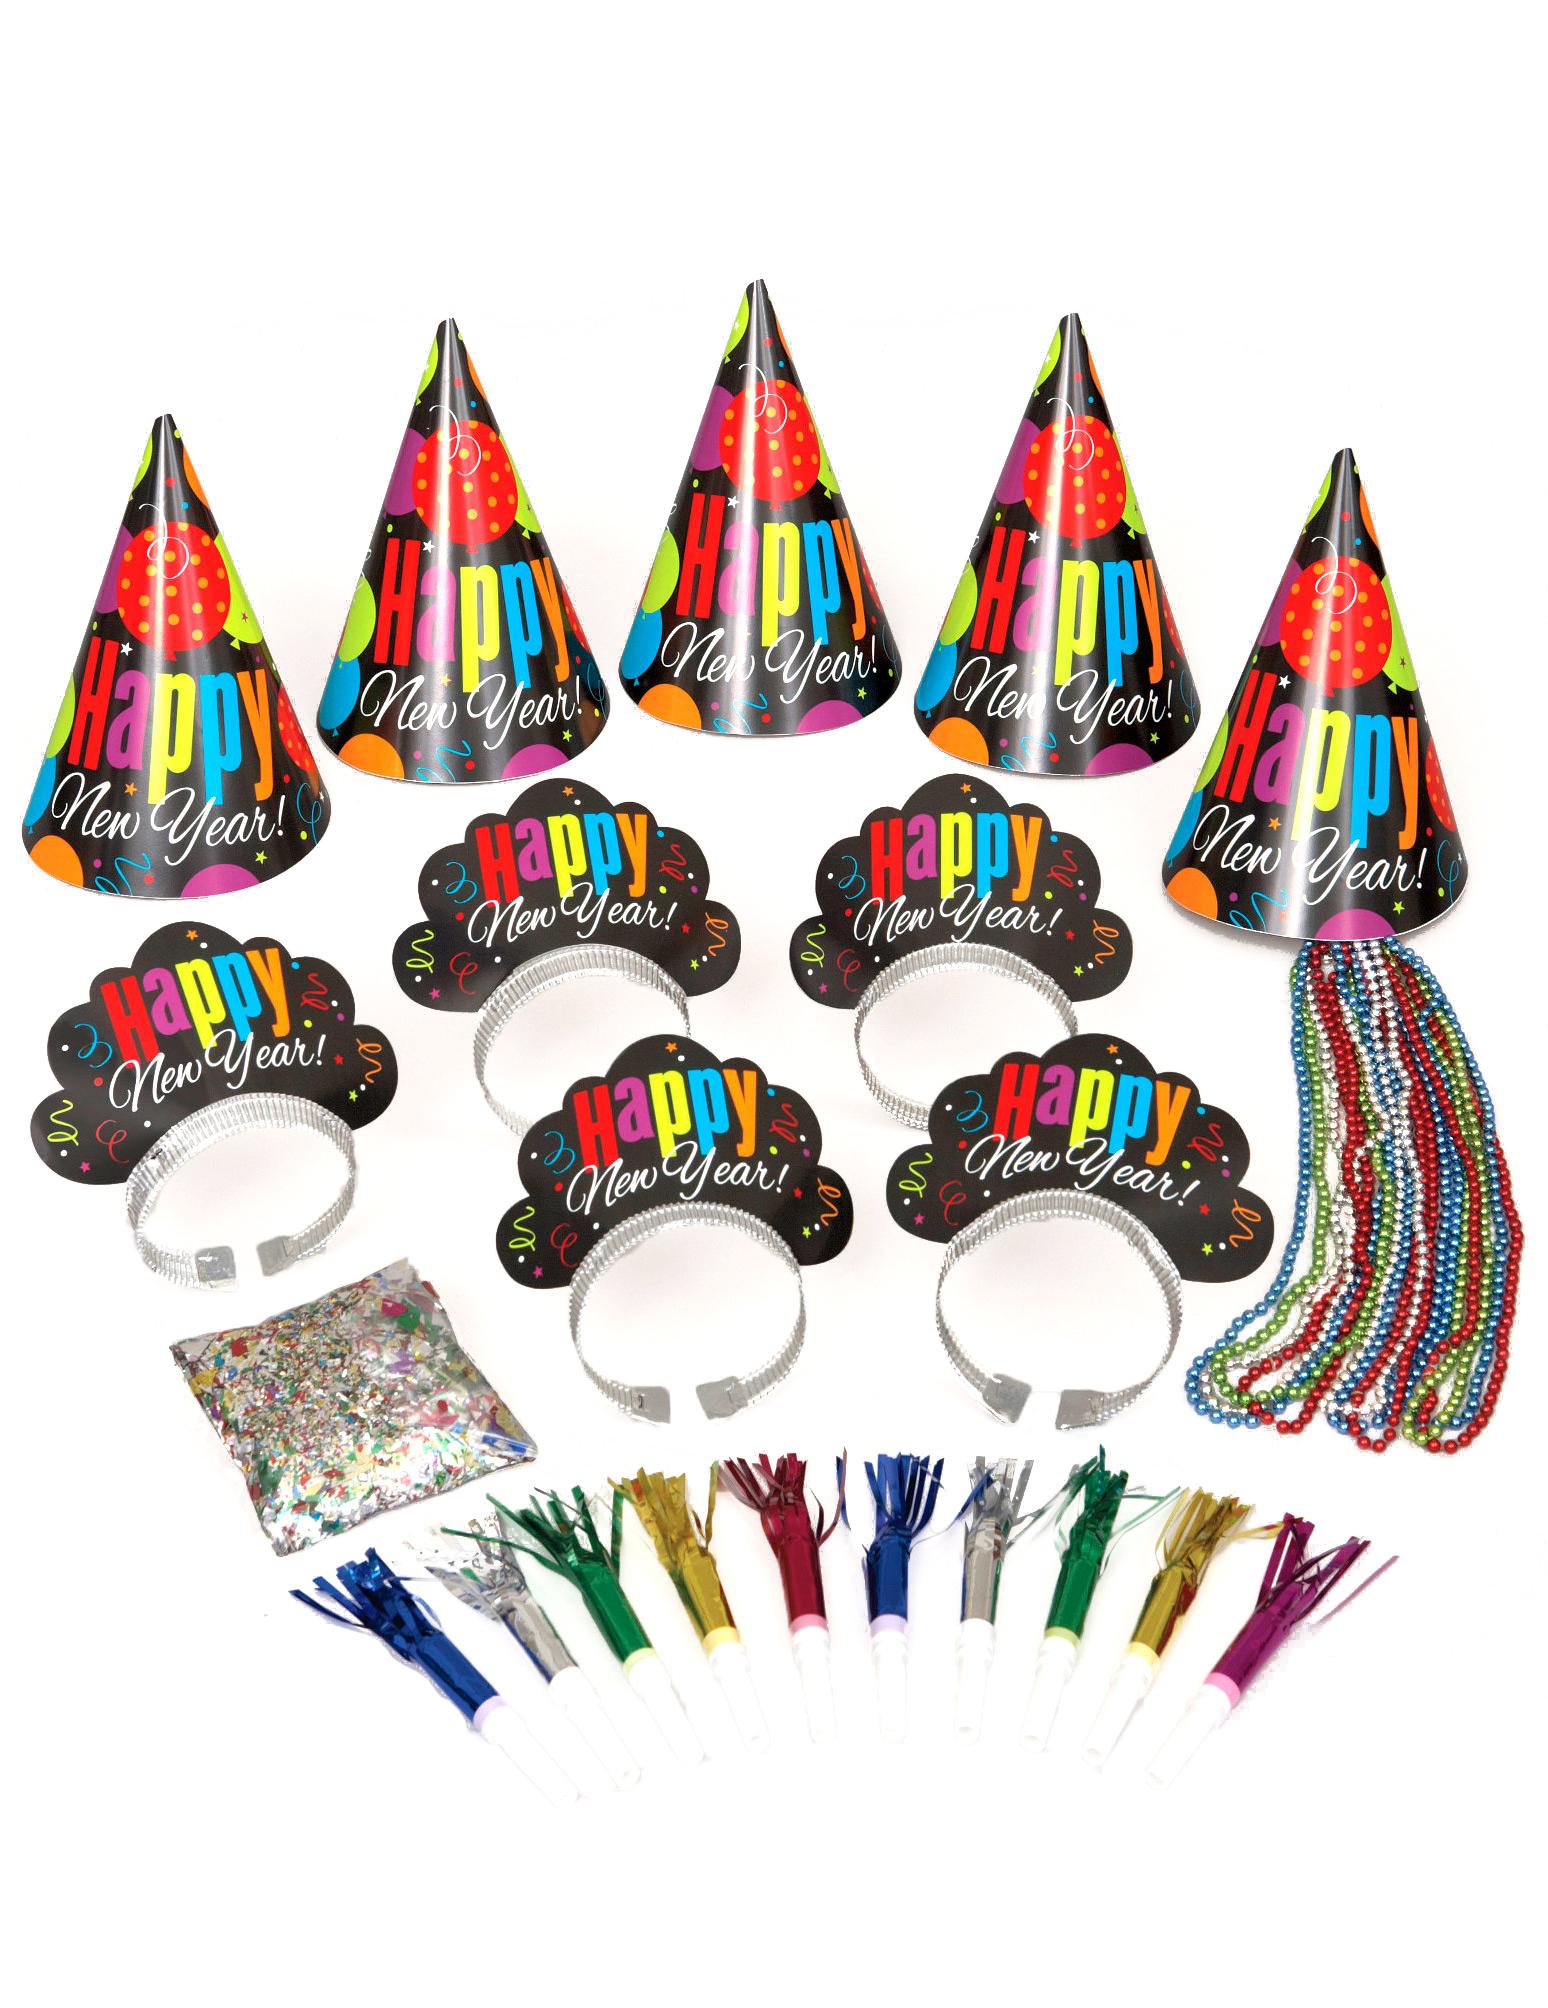 silvester party set f r 10 personen g nstige faschings partydeko zubeh r bei karneval megastore. Black Bedroom Furniture Sets. Home Design Ideas